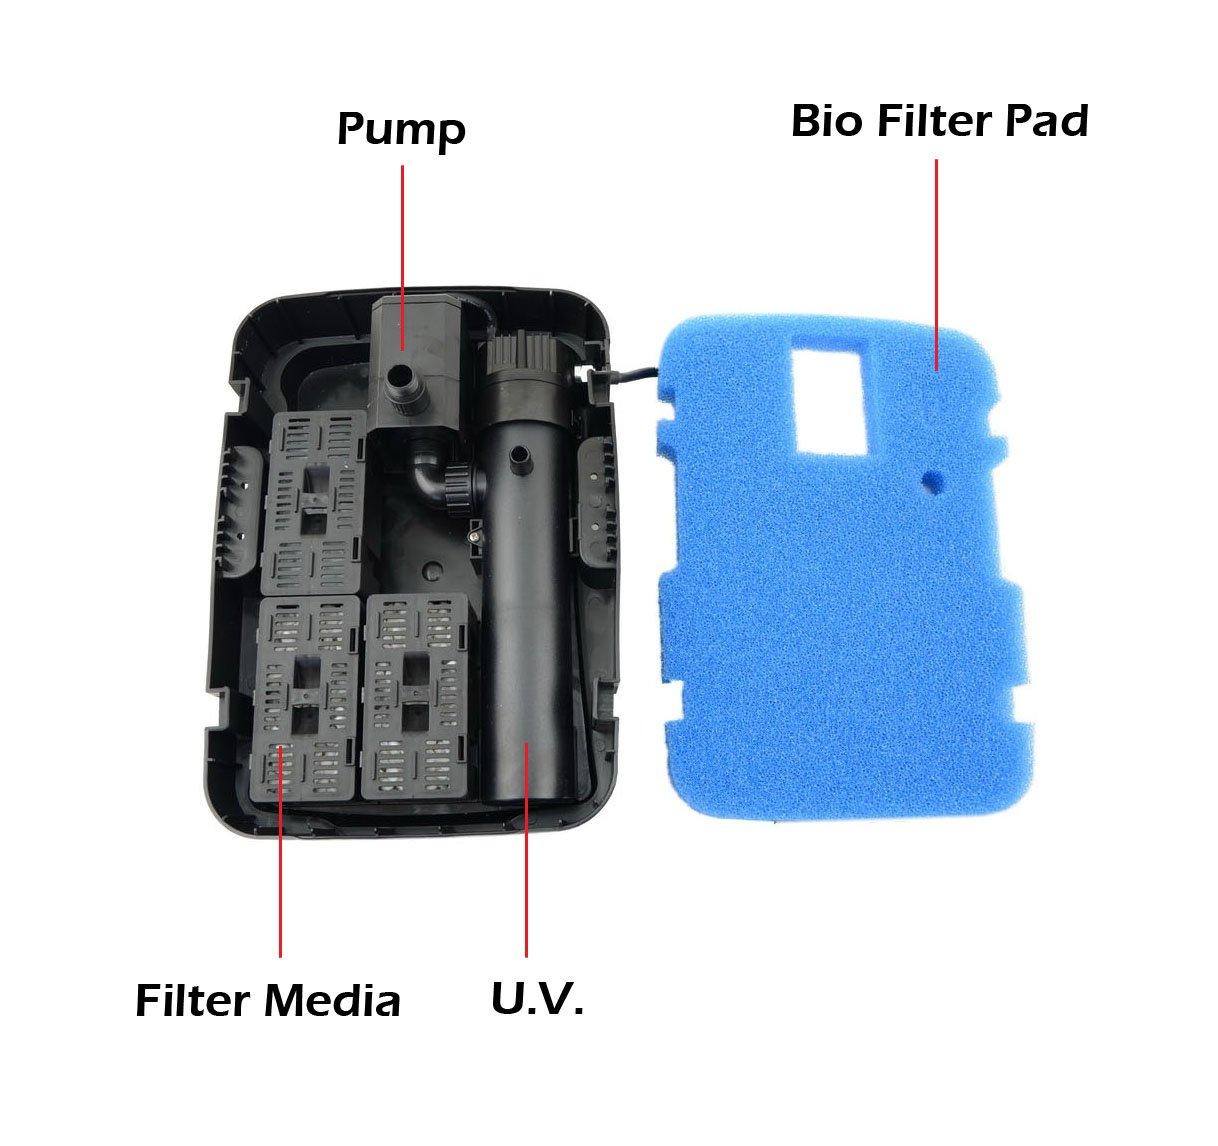 13W UV Sterilizer /& Pond Filtration System w// 660 GPH Pump Fountain Kit